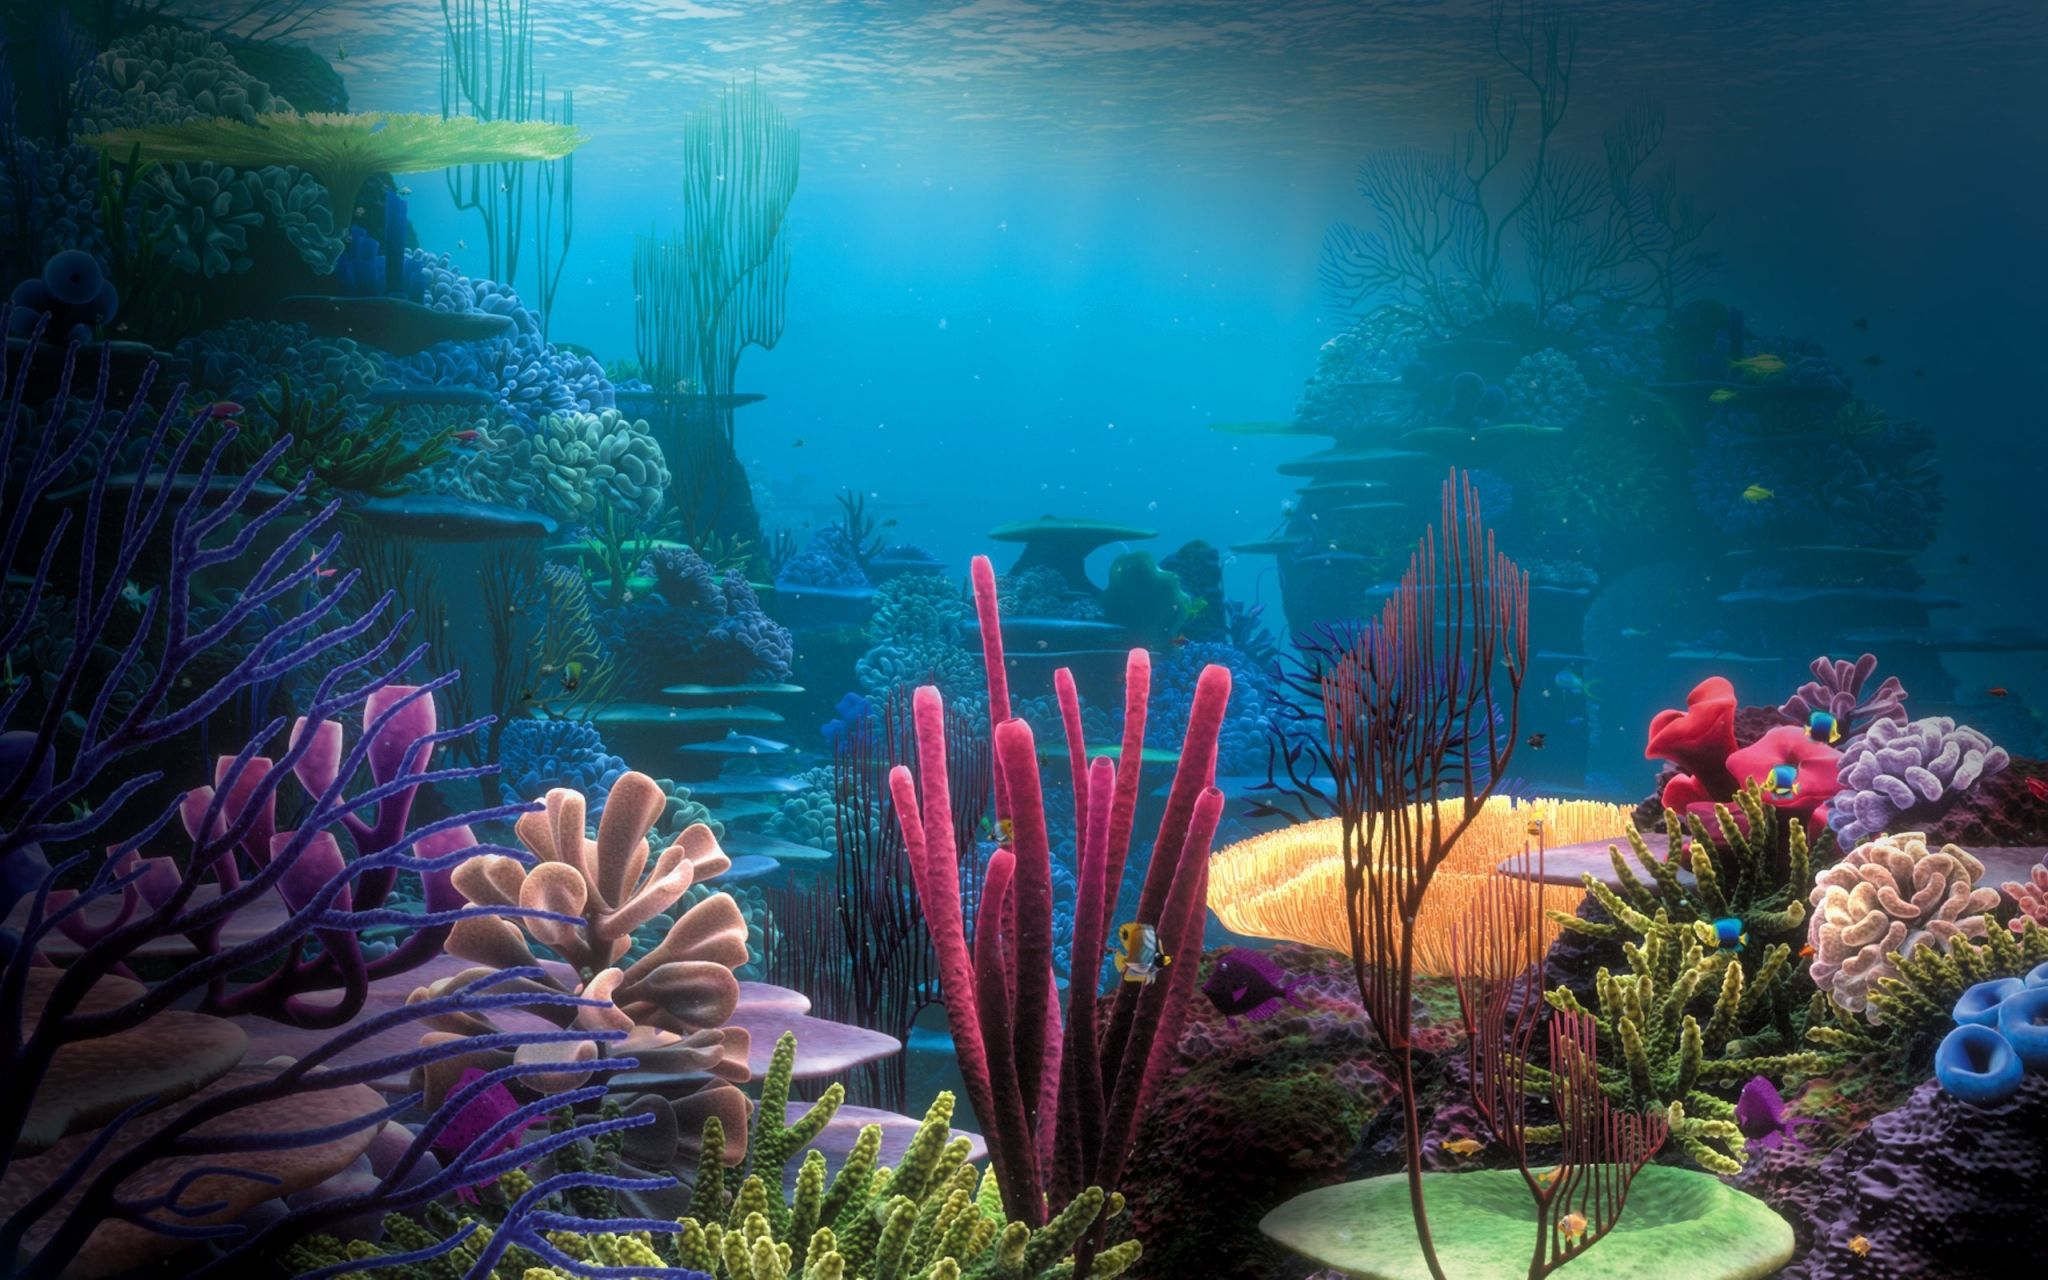 Underwater Wallpaper Pictures Free